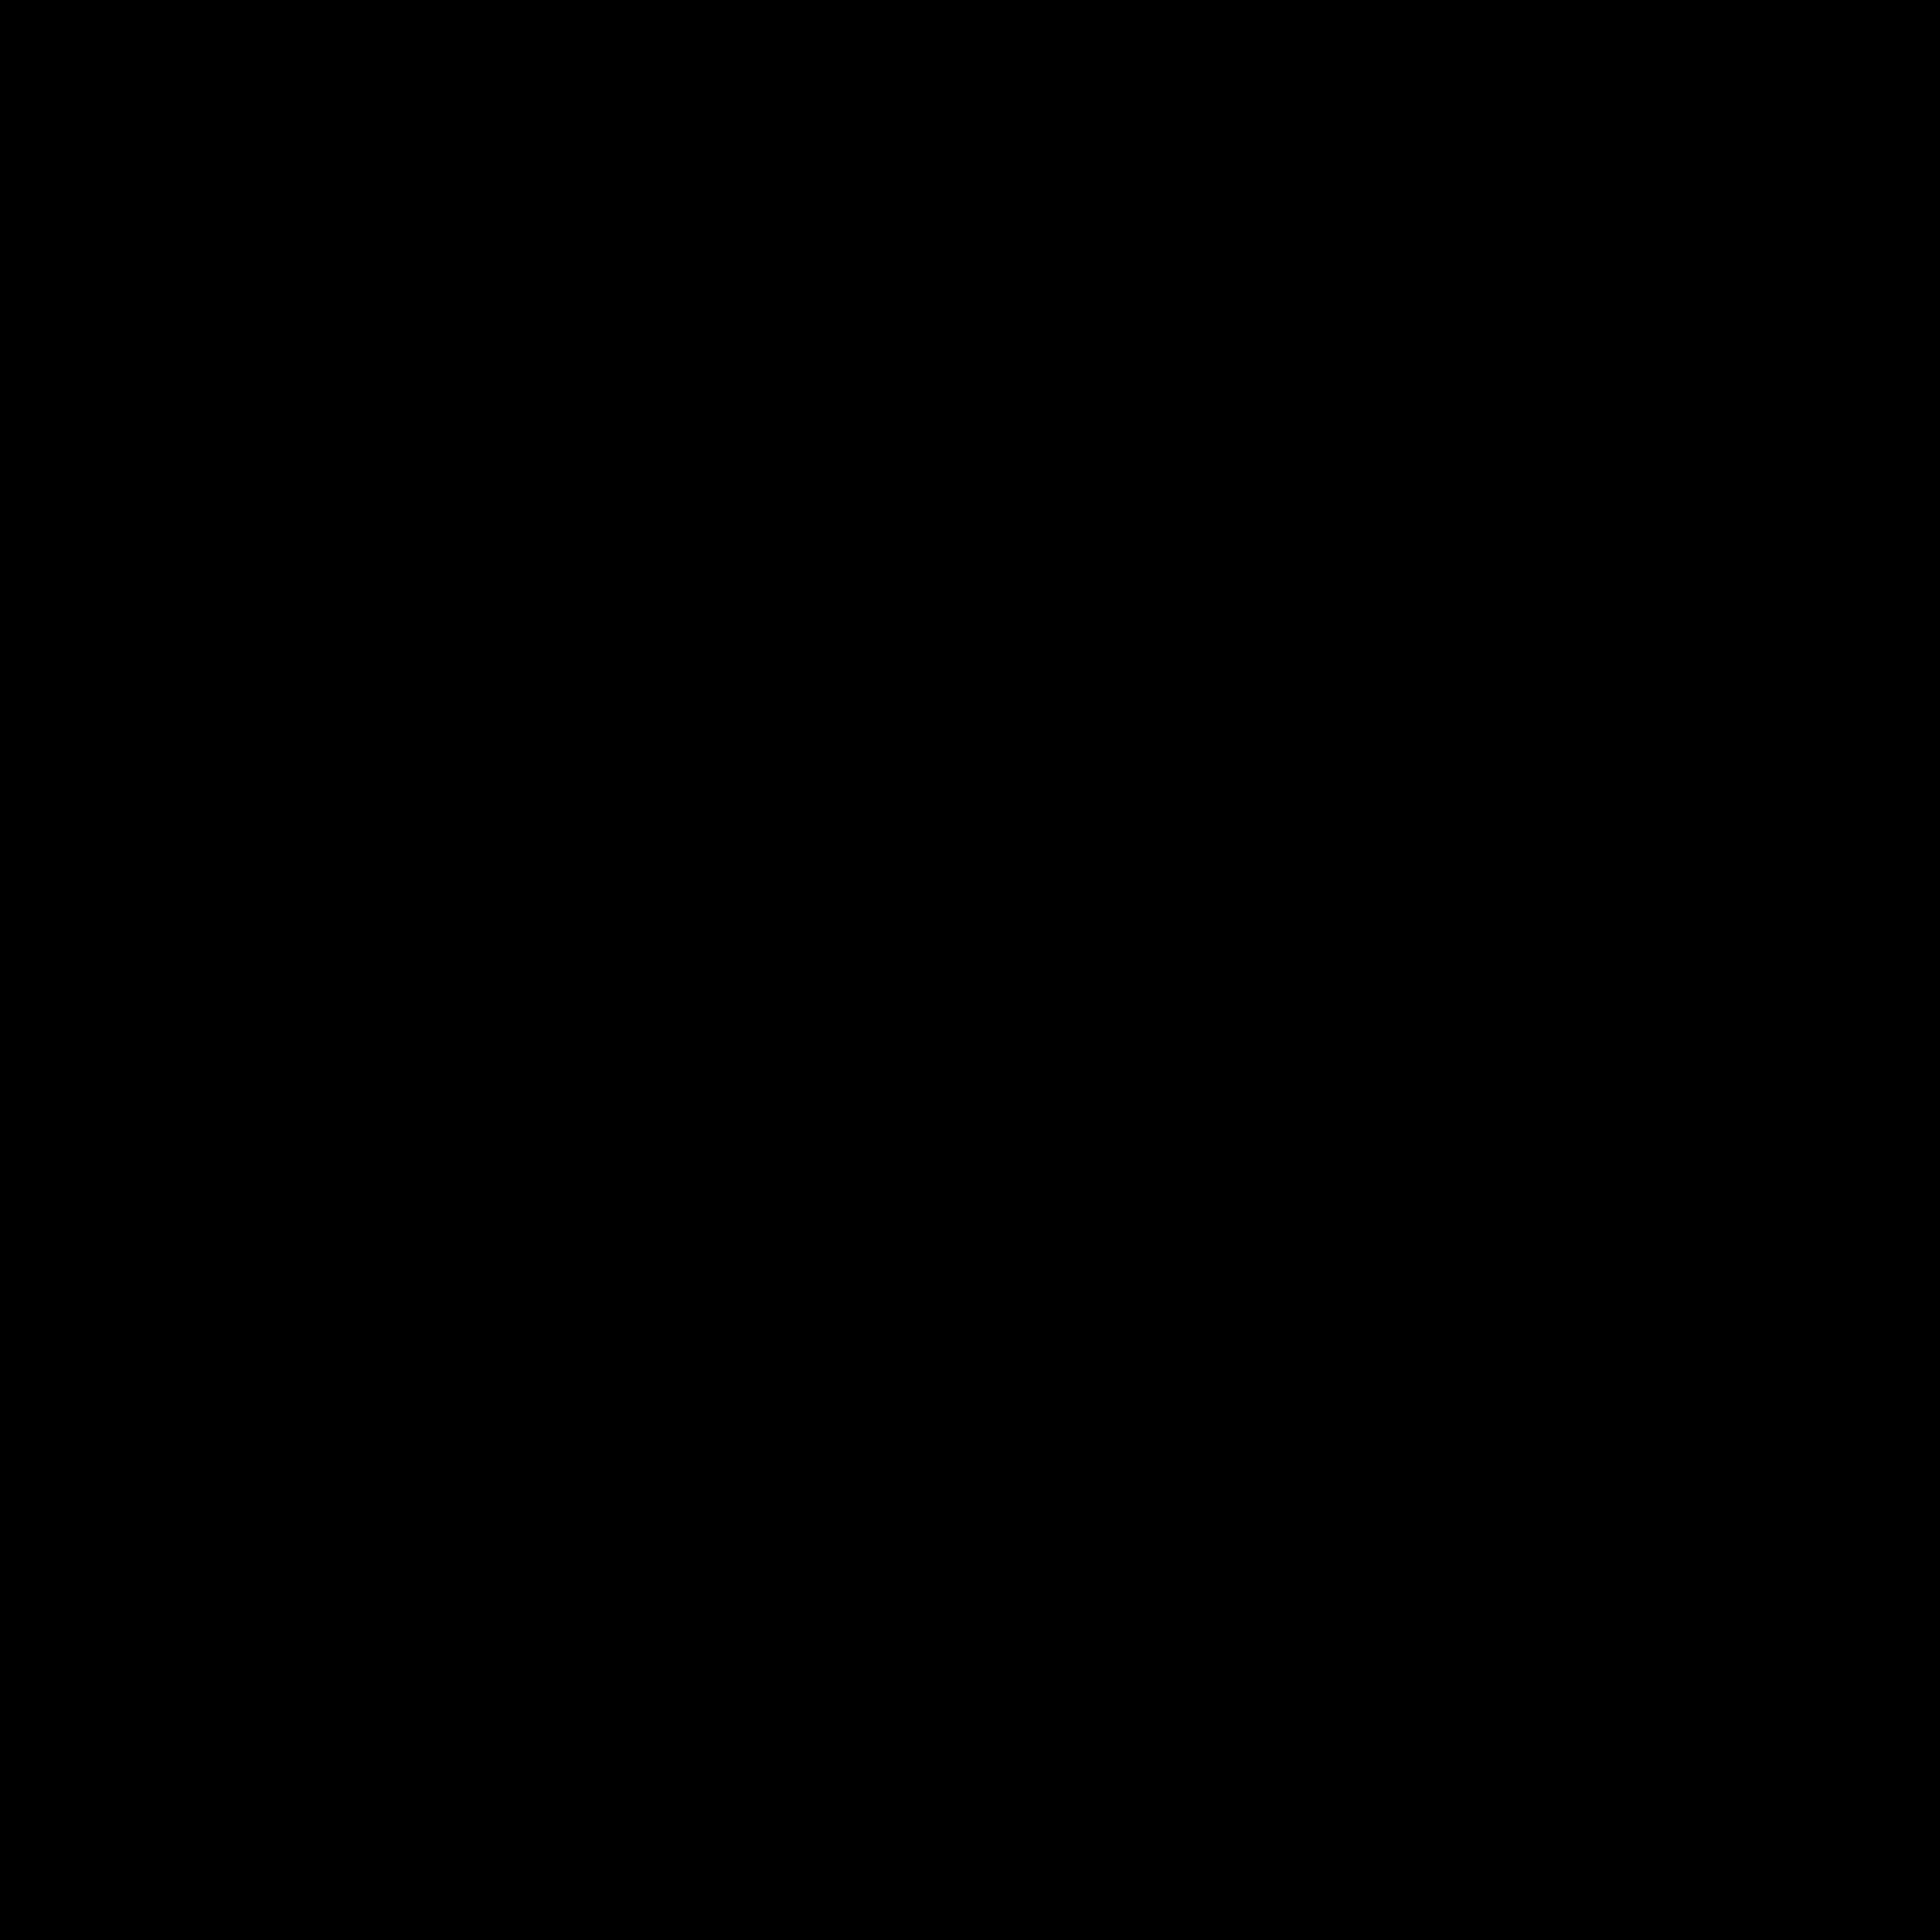 2732x2732 Black Solid Color Background